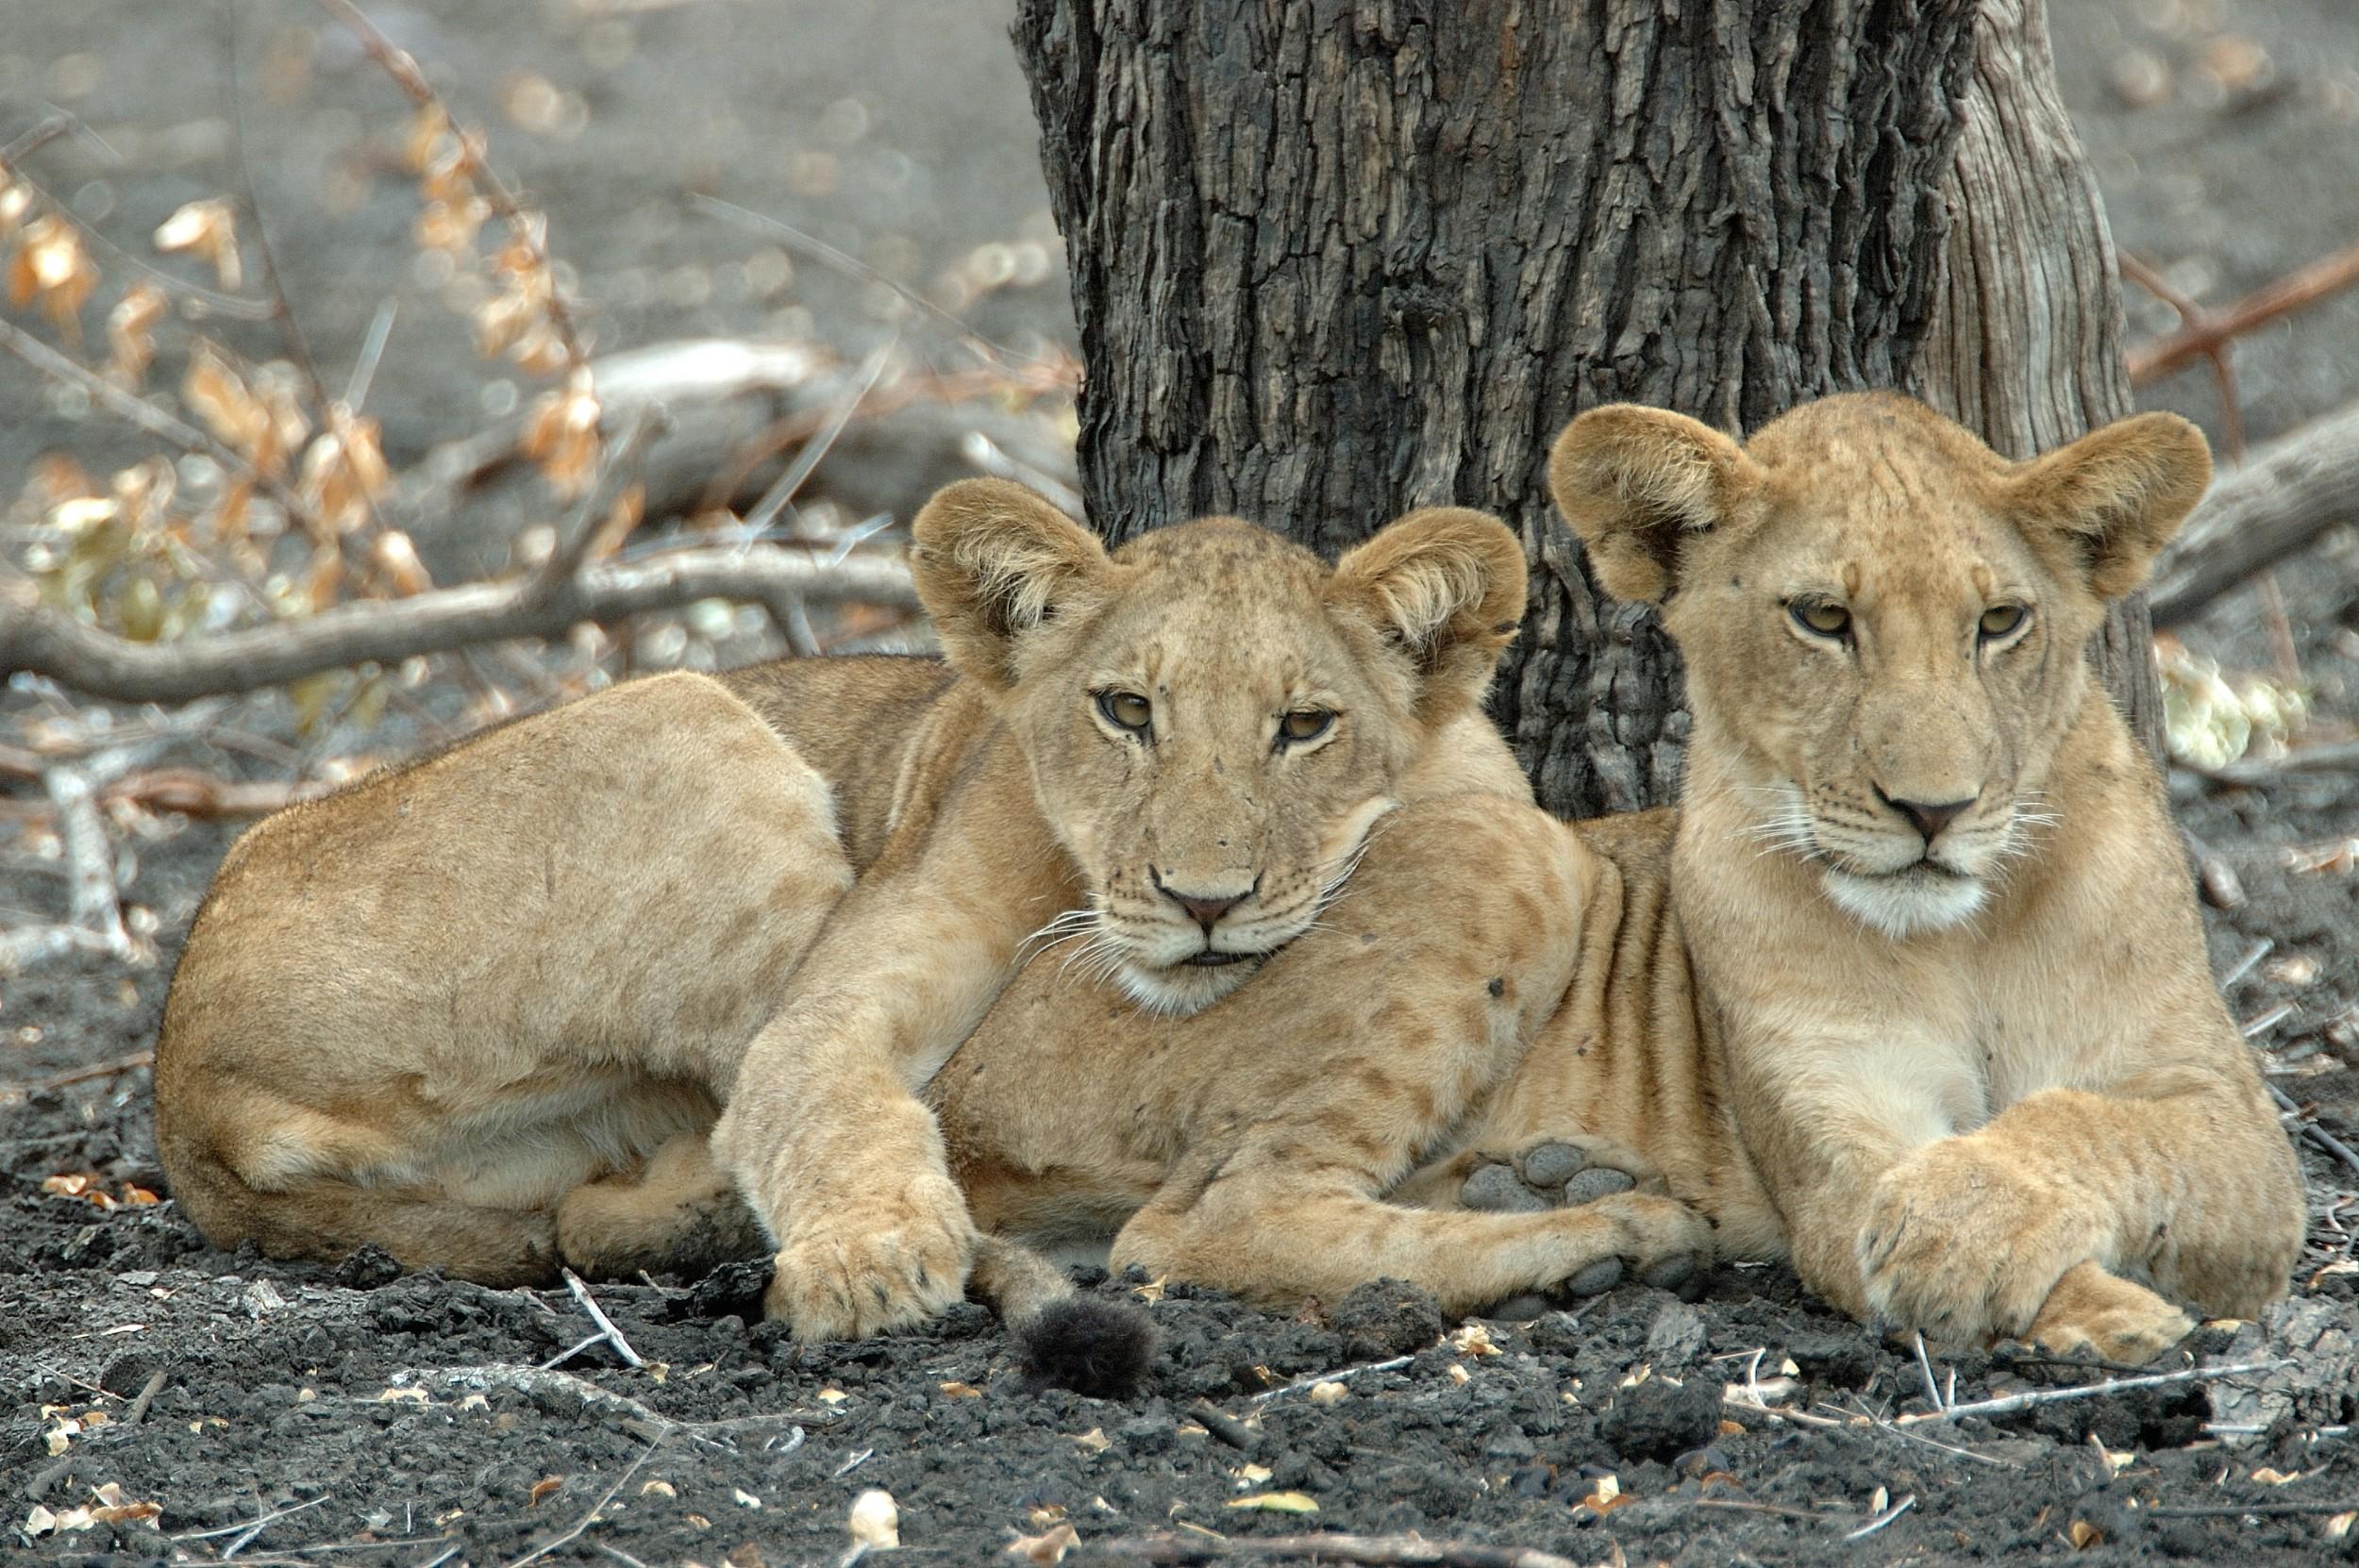 PL-Selous-lion-relaxing-by-tree.jpg